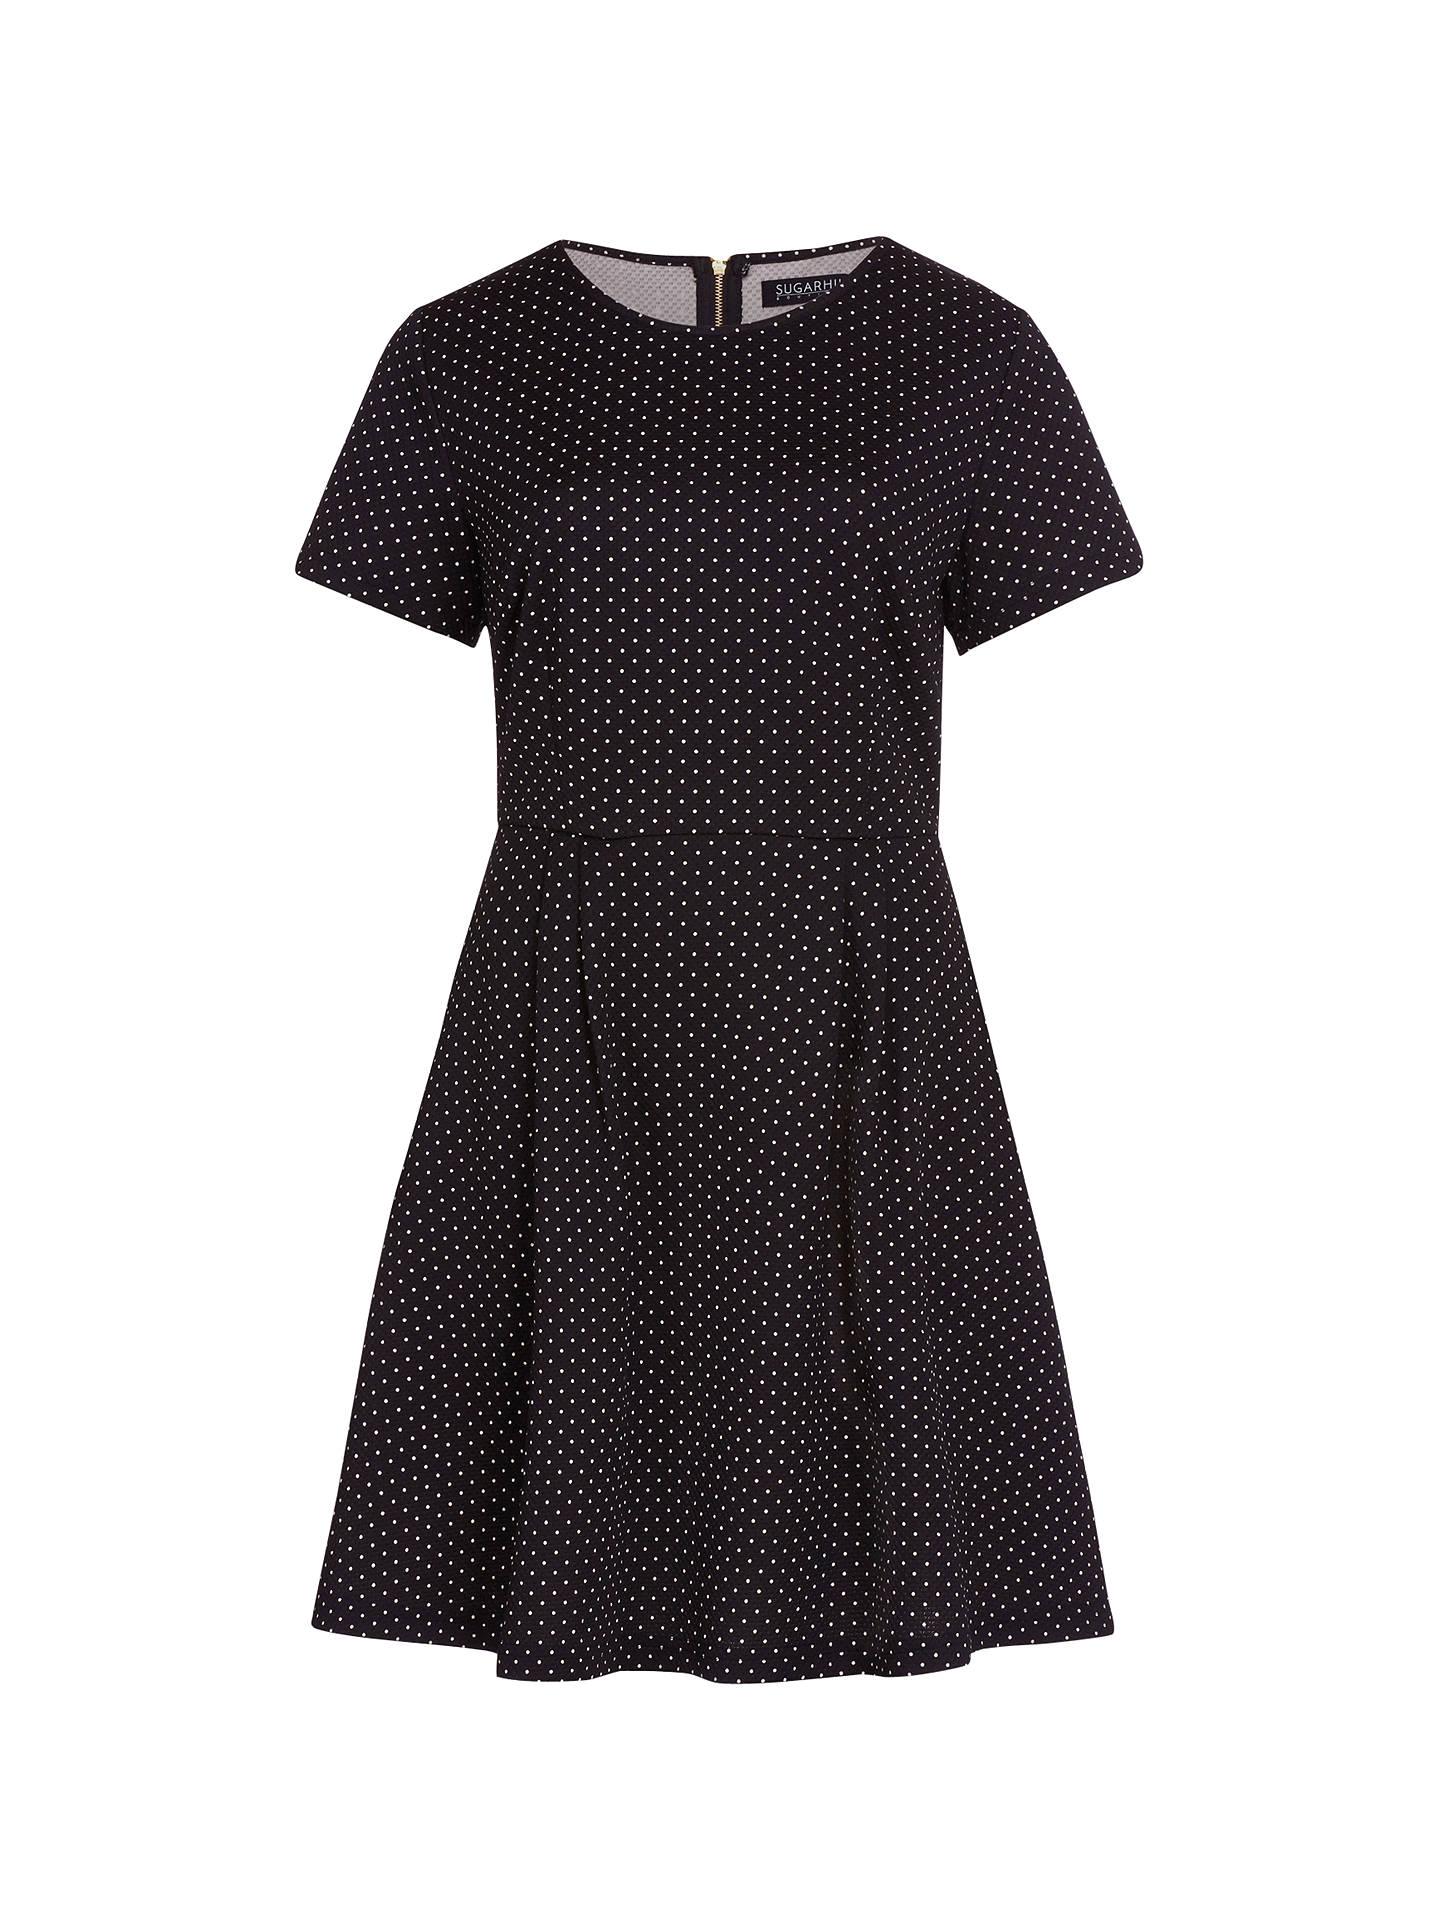 Sugarhill Boutique Irene Spot Fit And Flare Dress Black